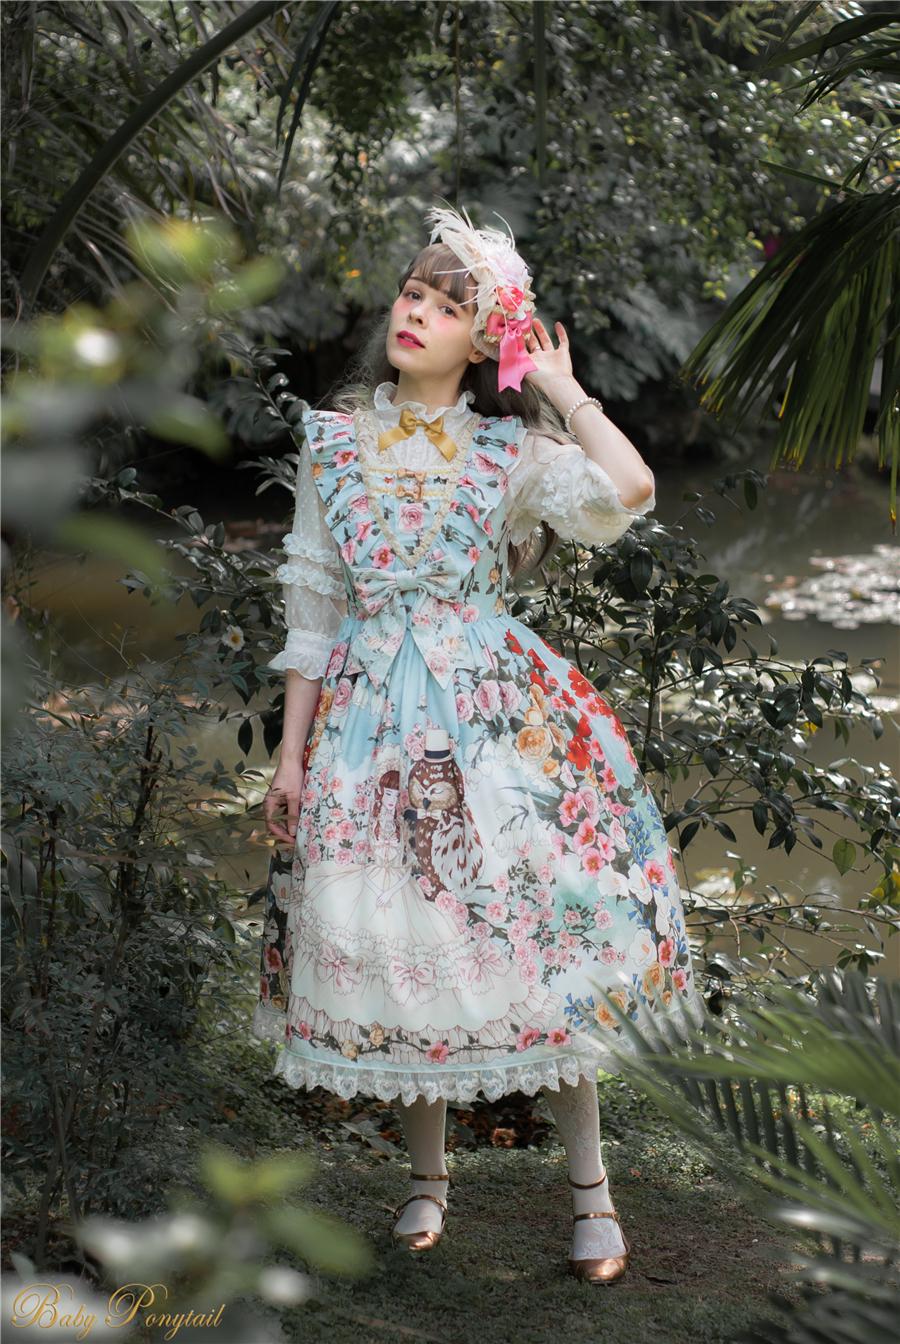 Baby Ponytail_Model Photo_Polly's Garden of Dreams_JSK Sky_Claudia11.jpg